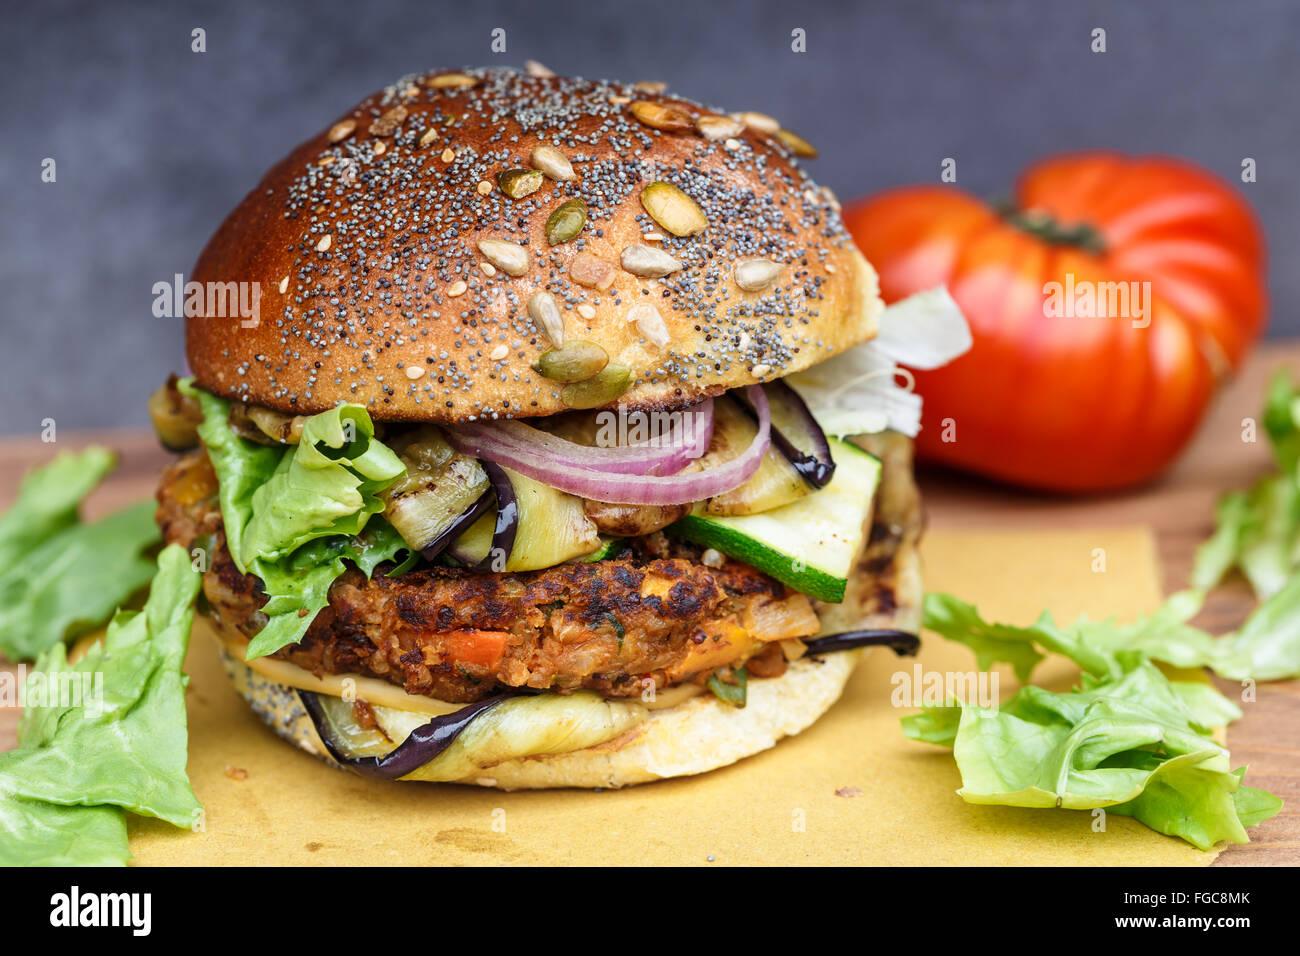 Veggie burger con cebolla, calabacín, berenjena Imagen De Stock